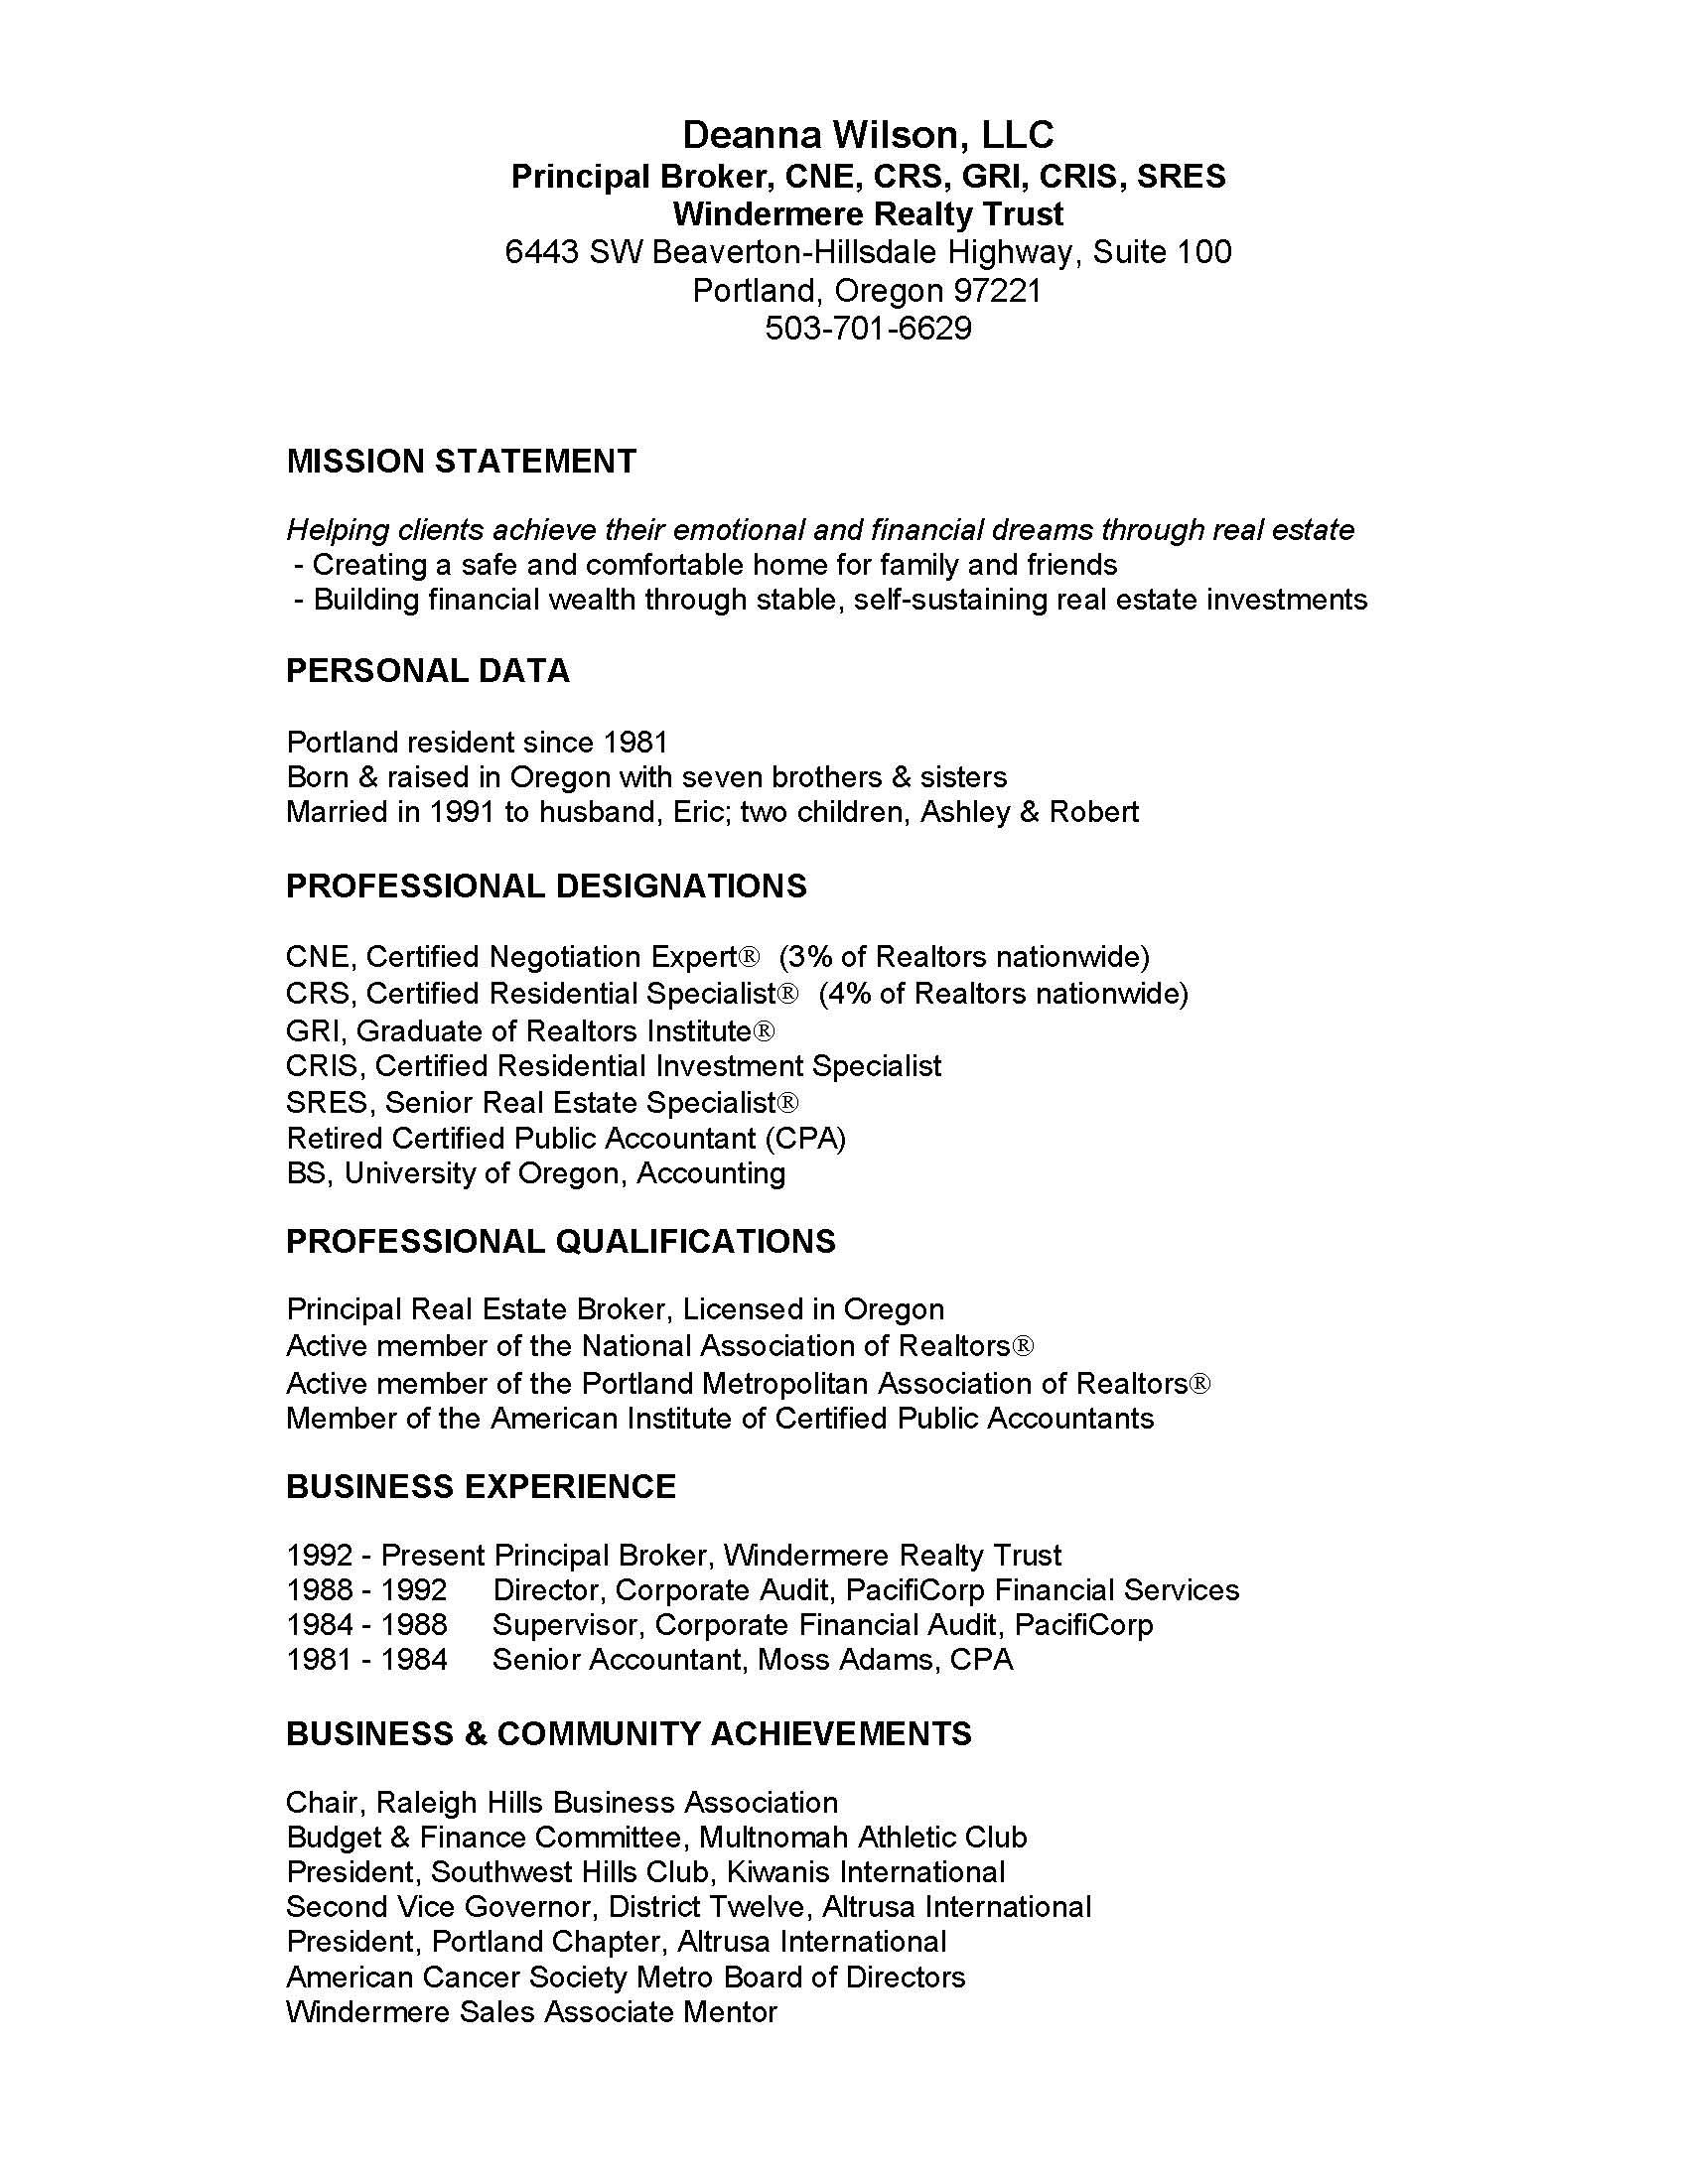 Professional Resume Deanna Wilson